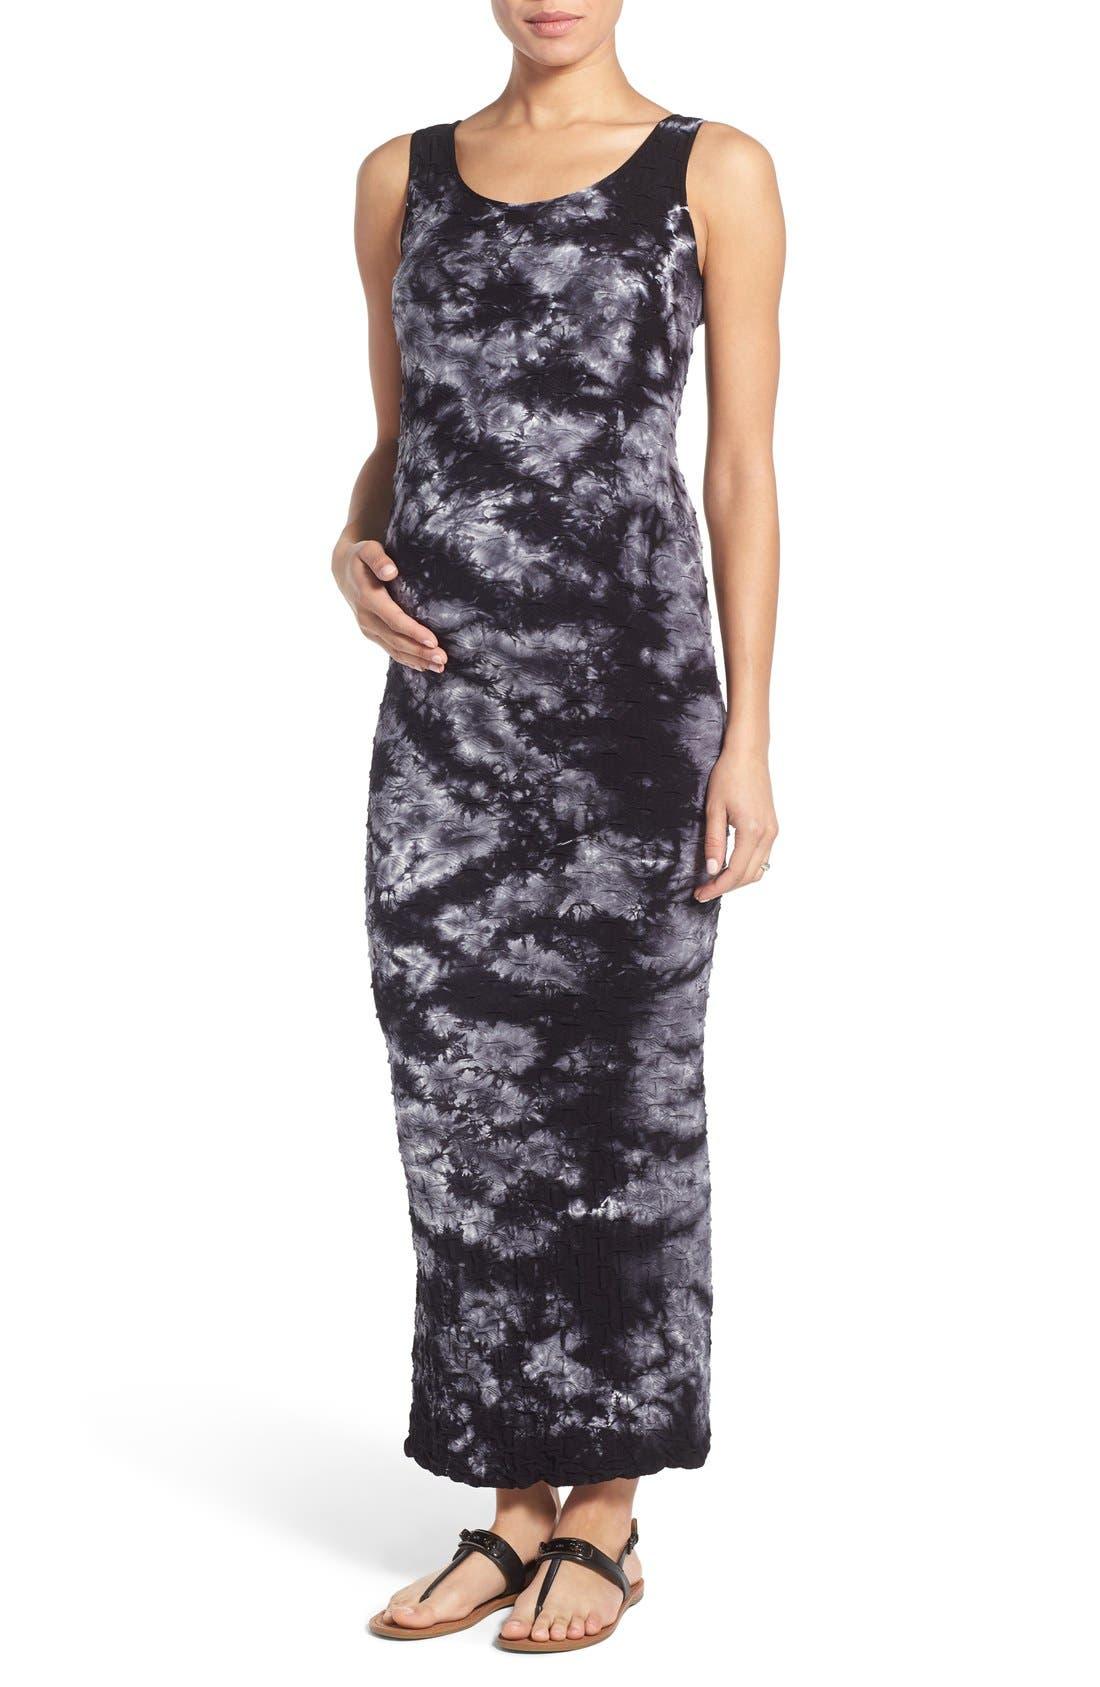 'Lattice' Tie Dye Textured Maternity Maxi Dress,                             Main thumbnail 1, color,                             BLACK